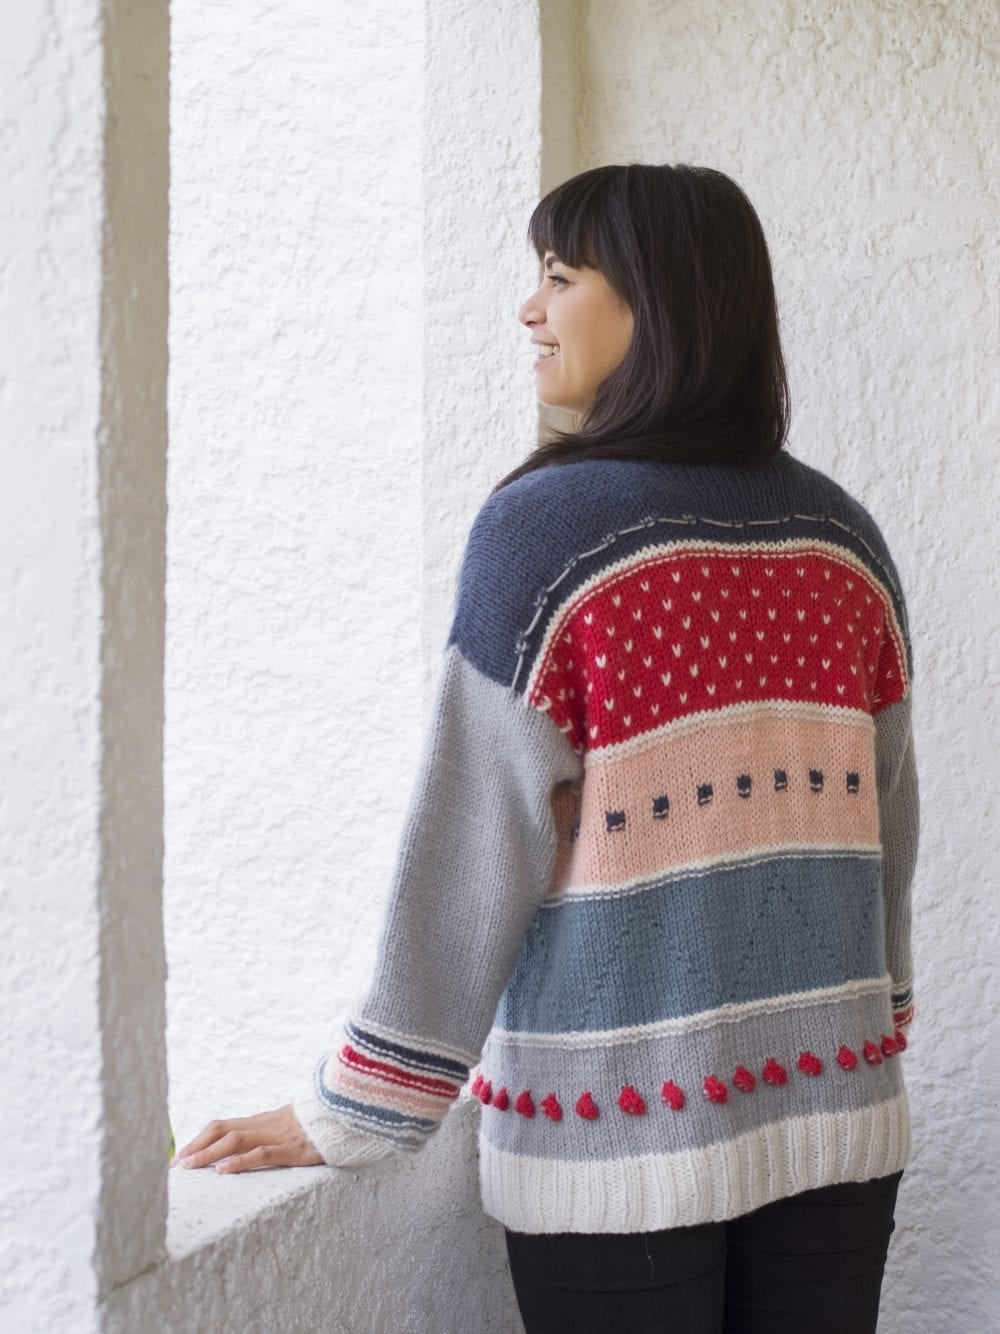 The Woven Mixed Tape Cardigan Knitting Pattern knit kit